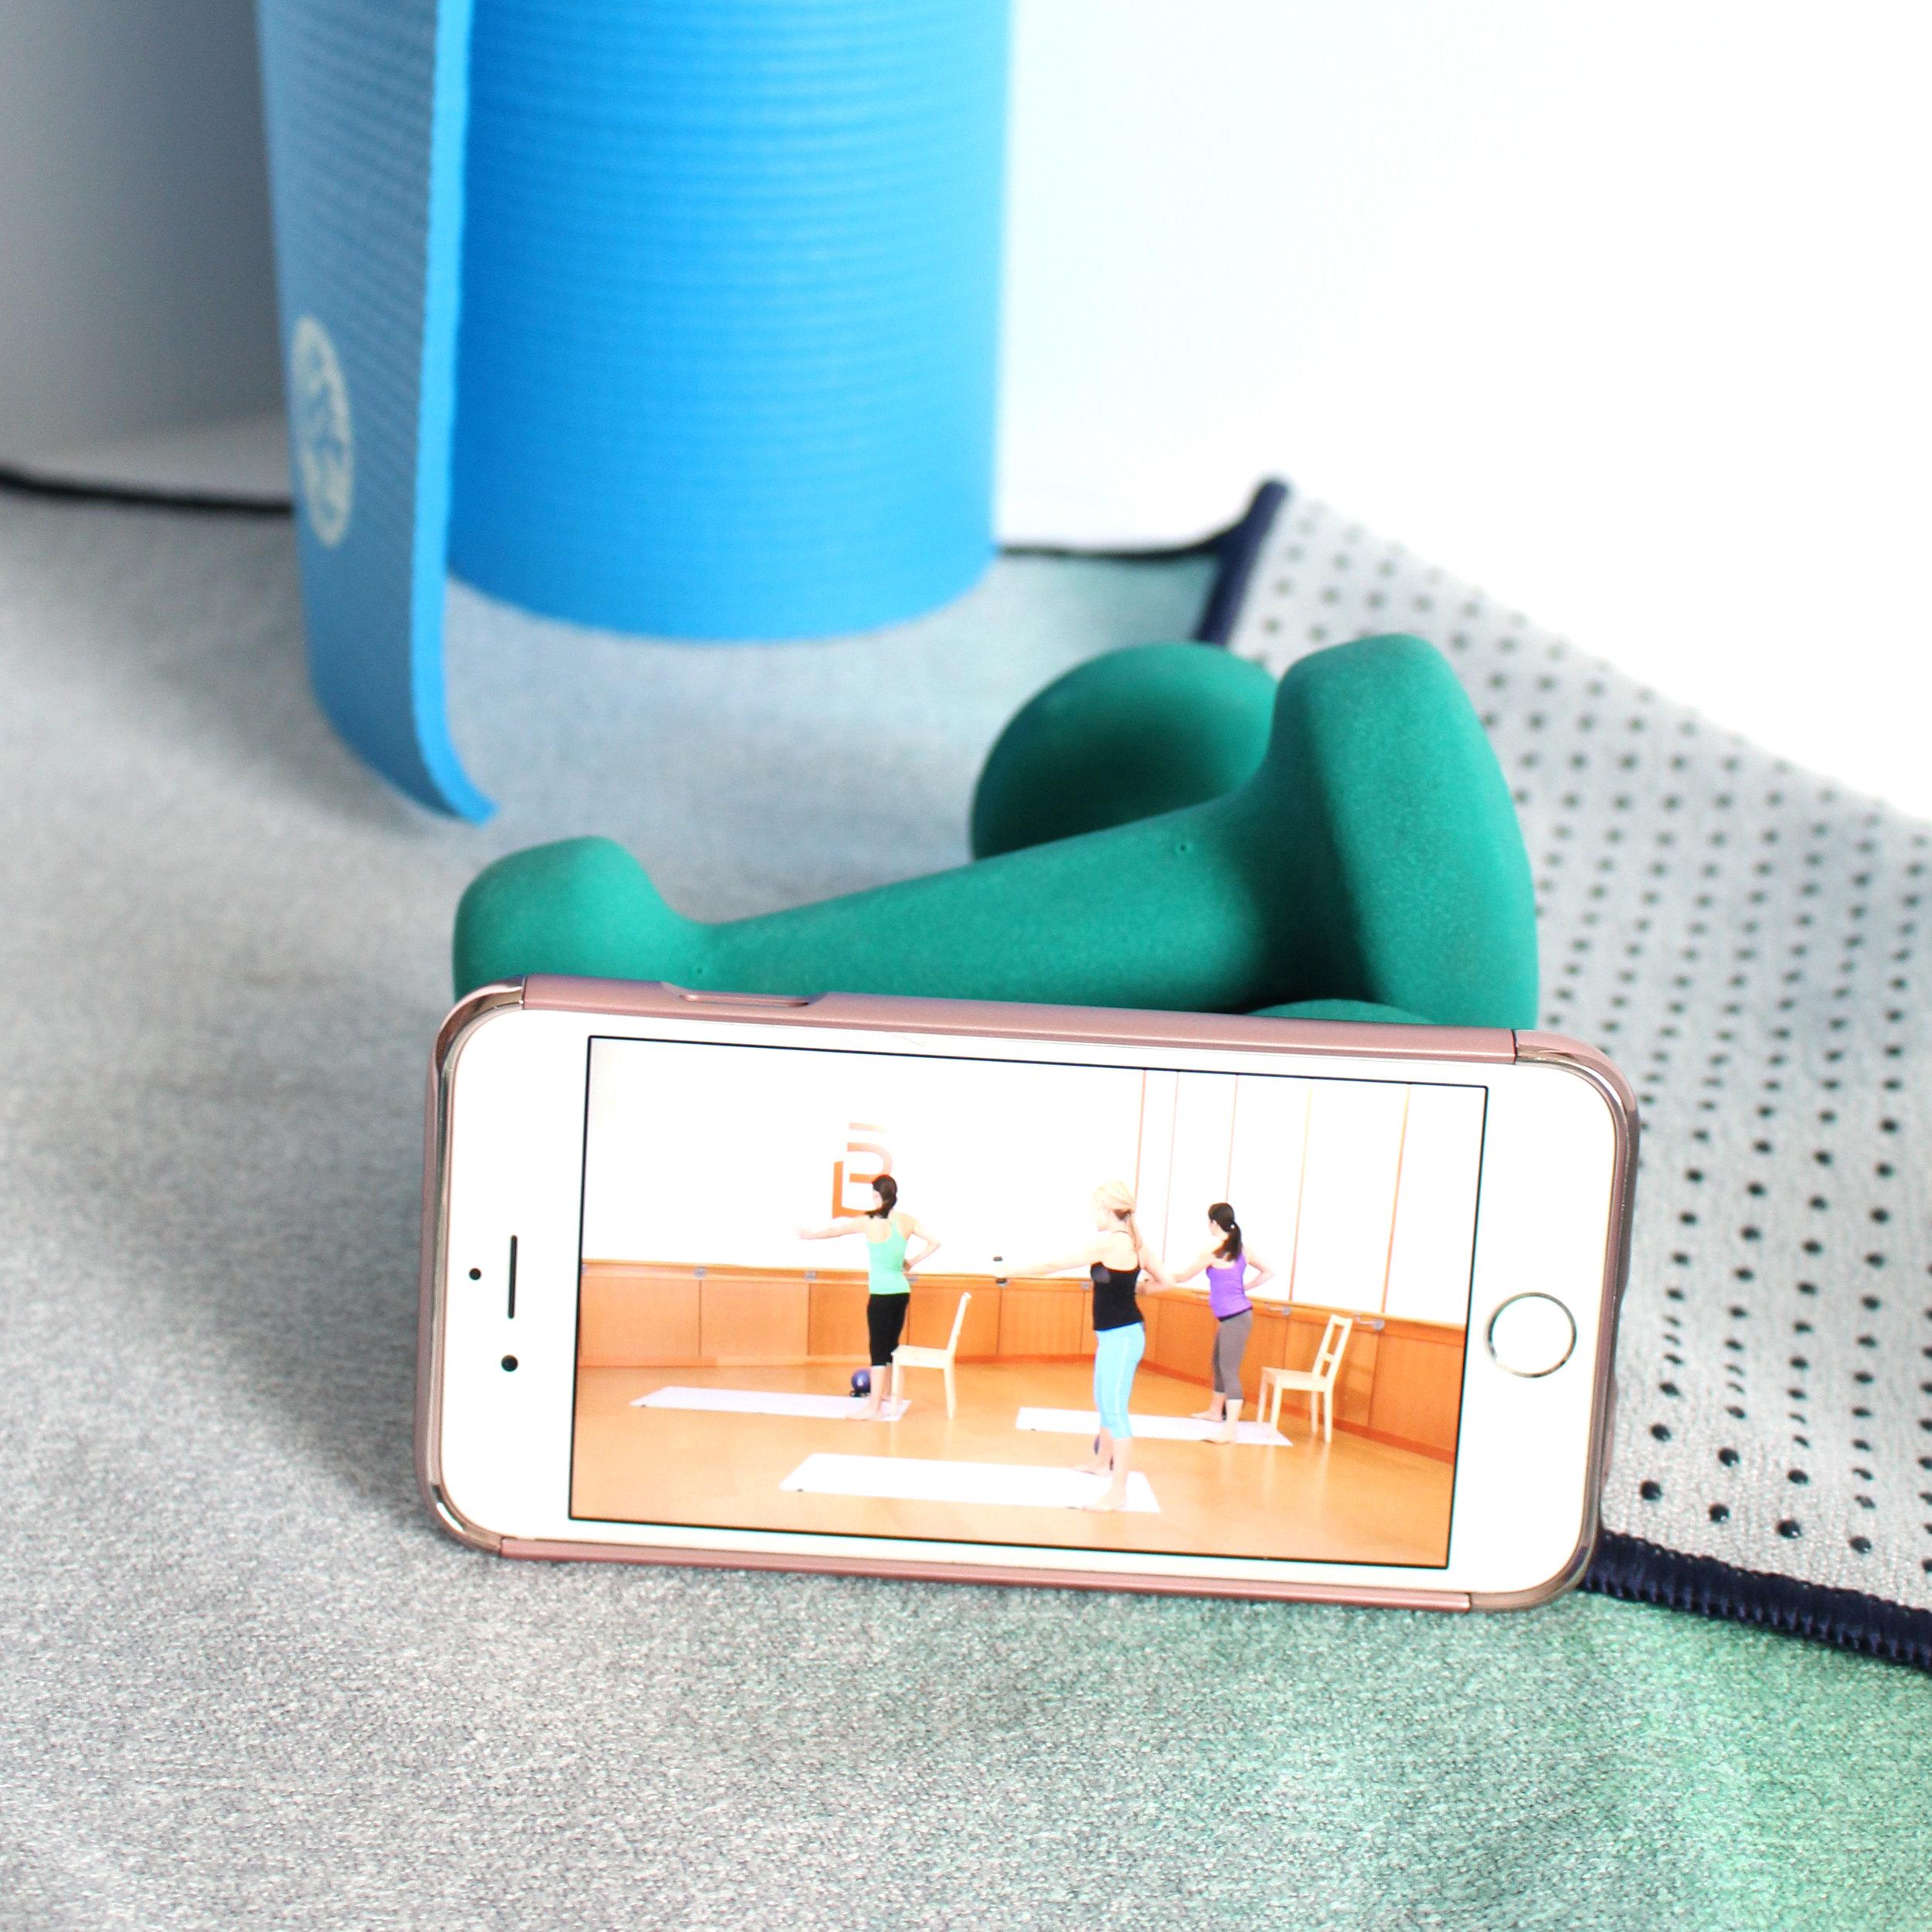 Phone-on-Yoga-Mat.jpg